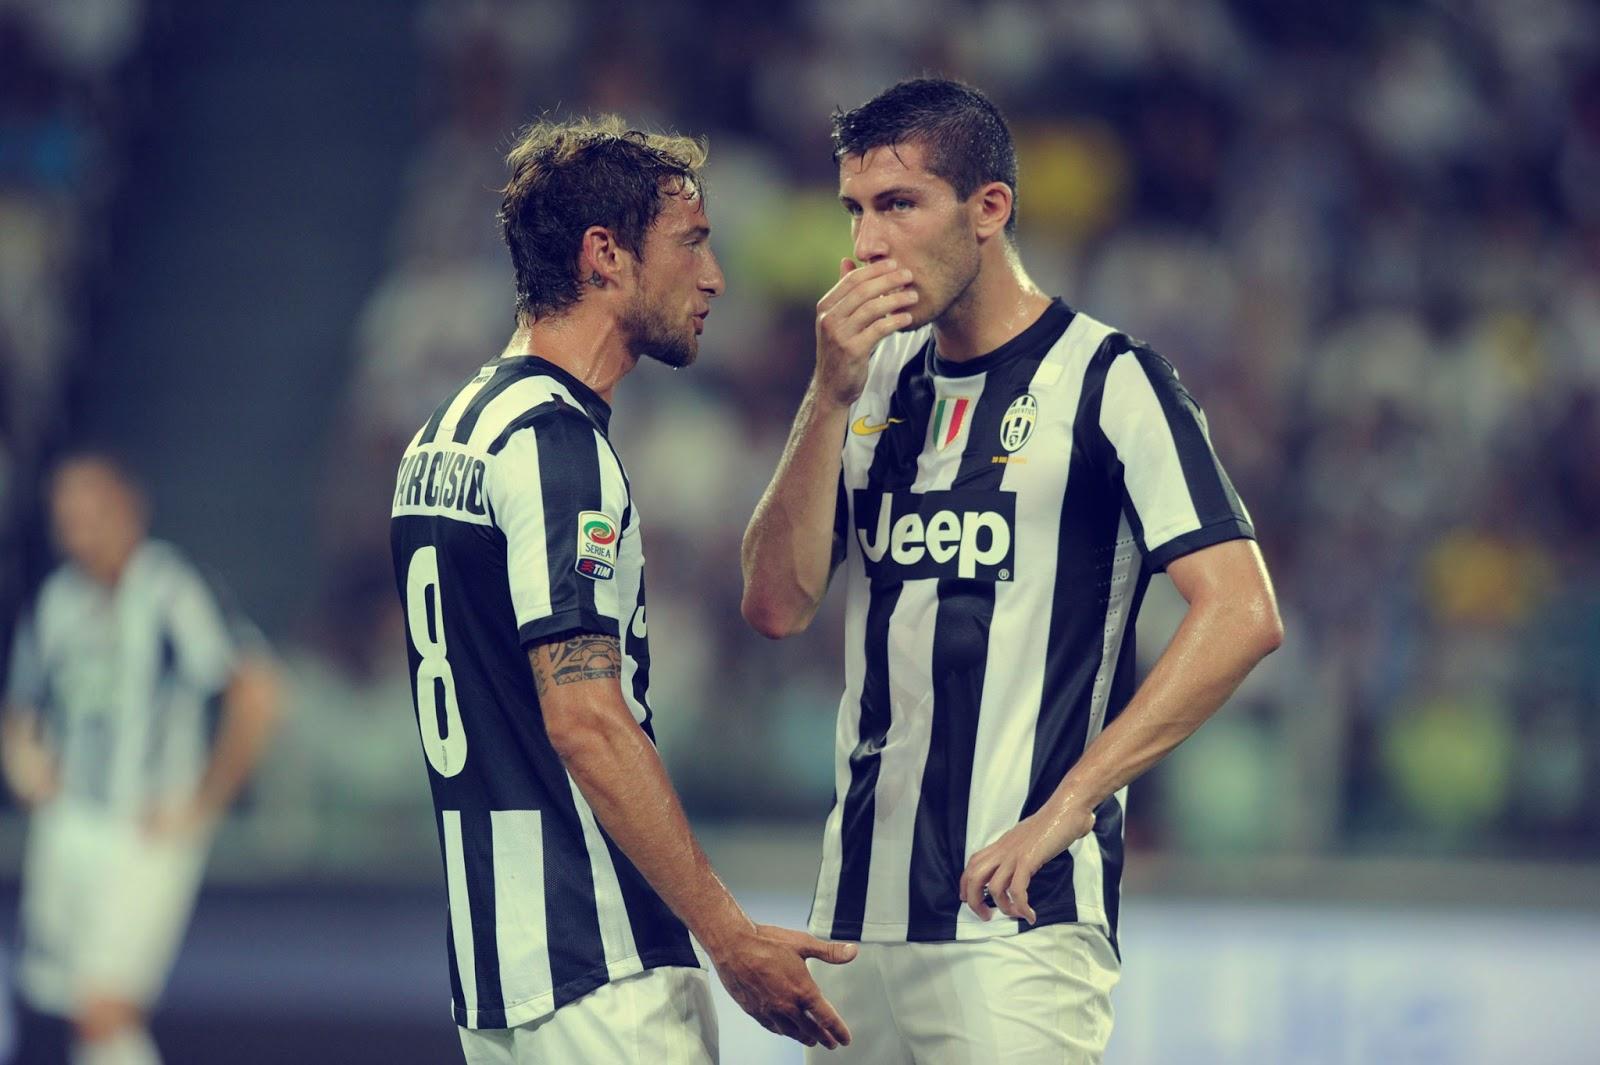 Free HD Juventus Football Club Wallpaper